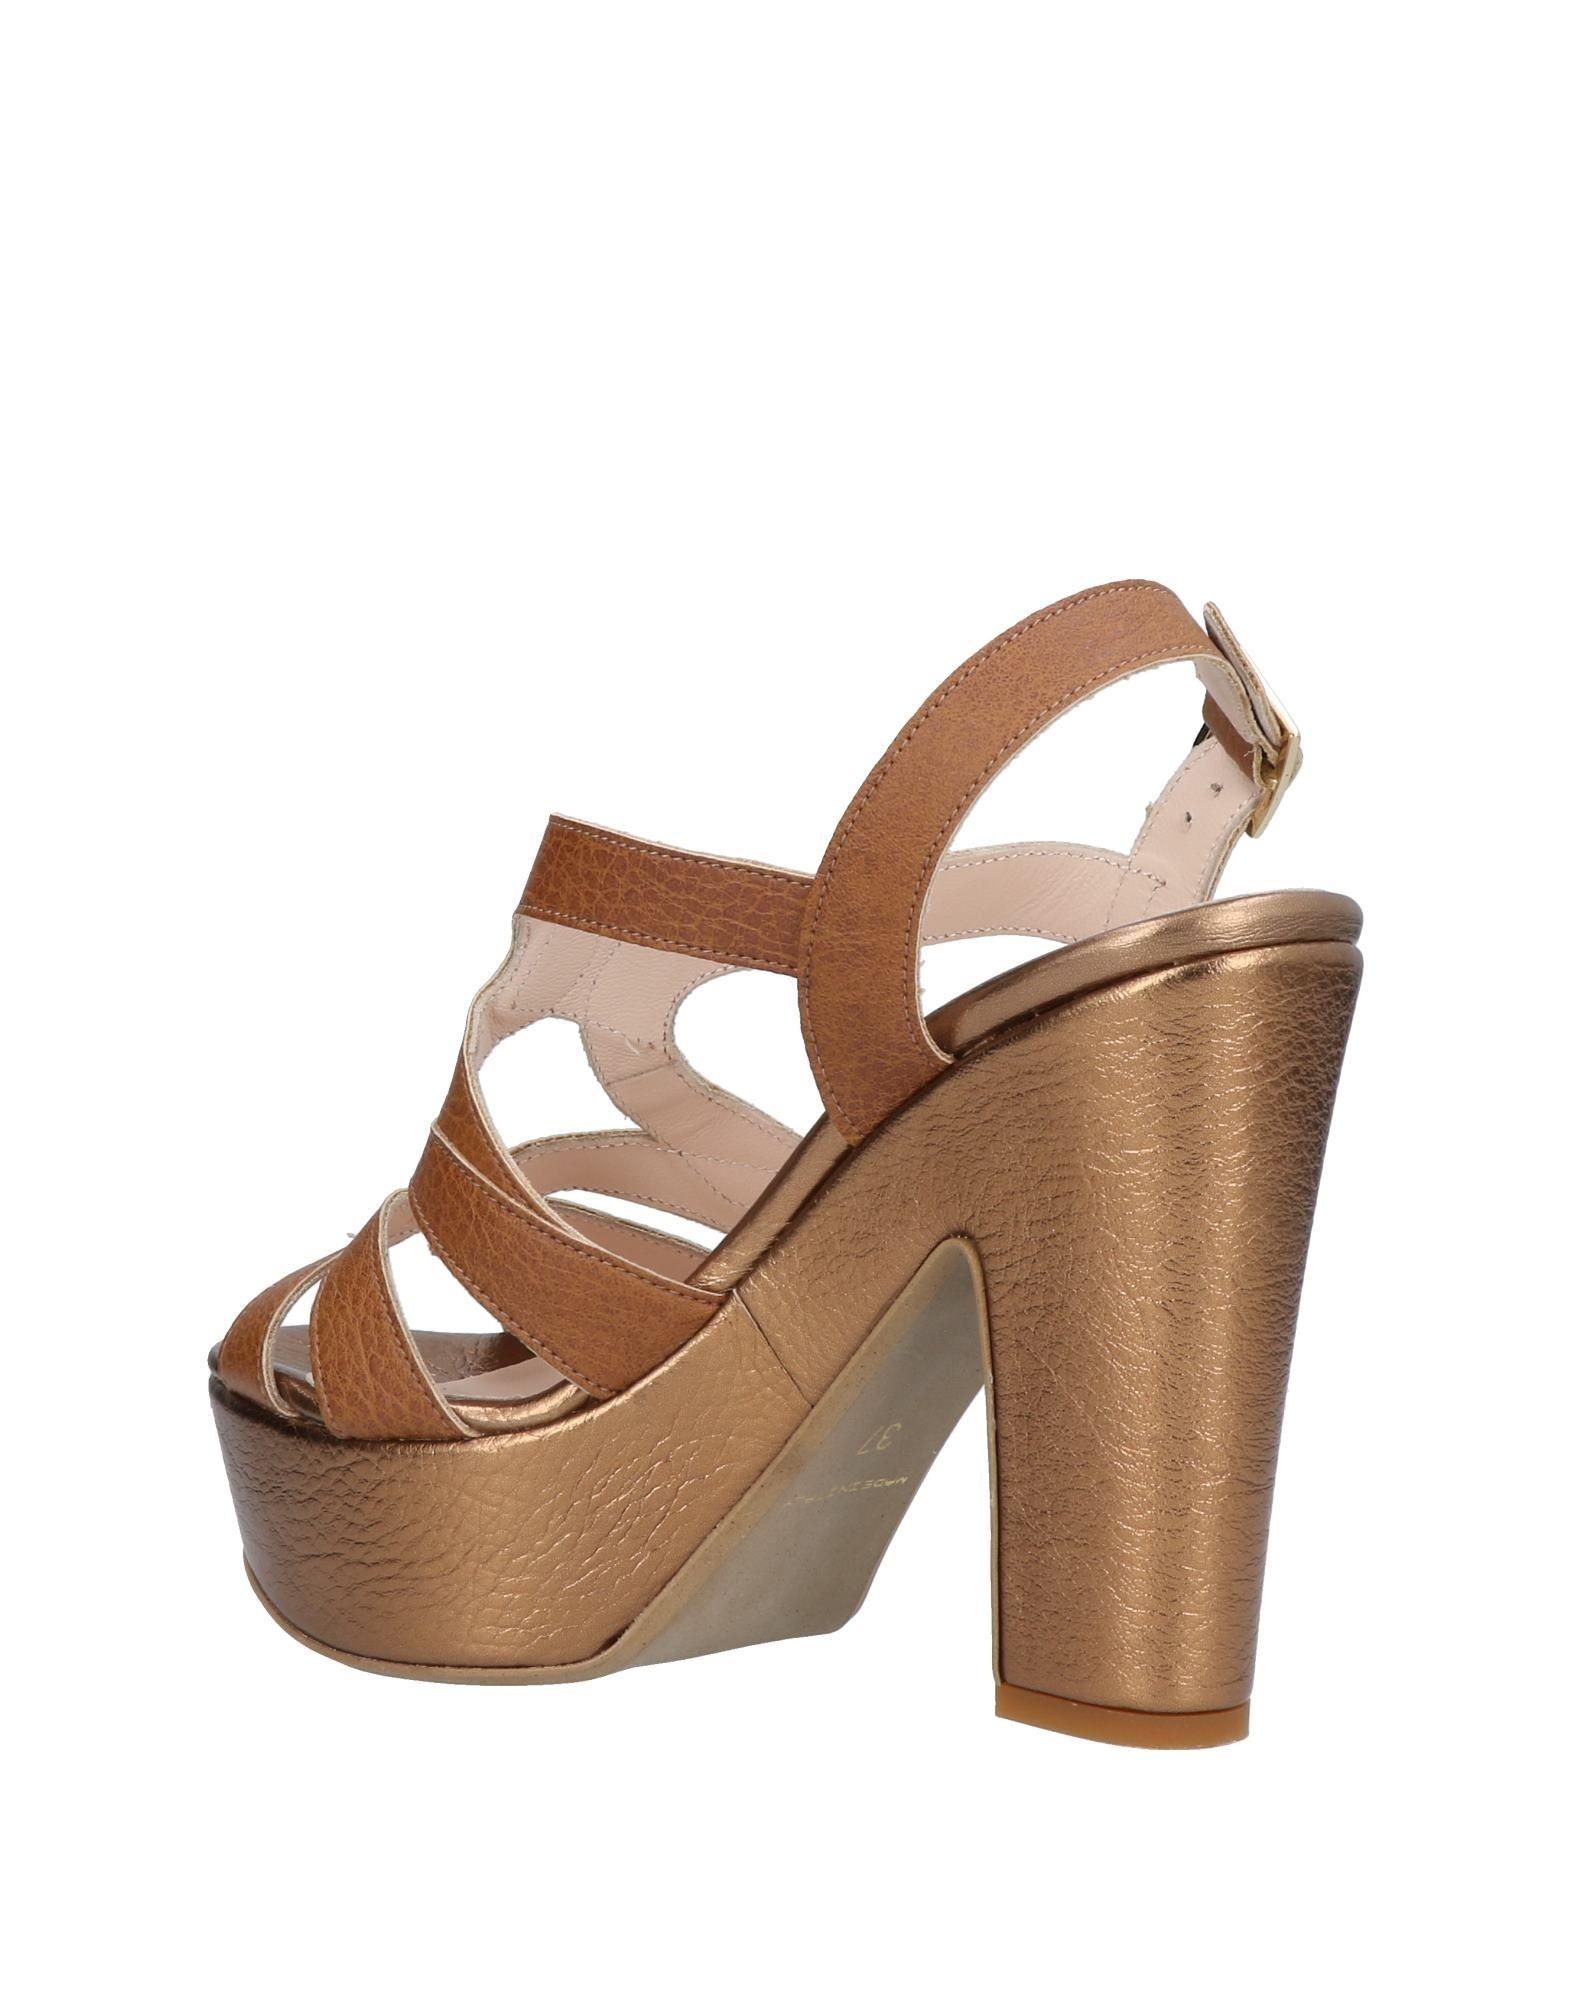 MICHEGGIO® Sandales femme. 0gtoKTeS